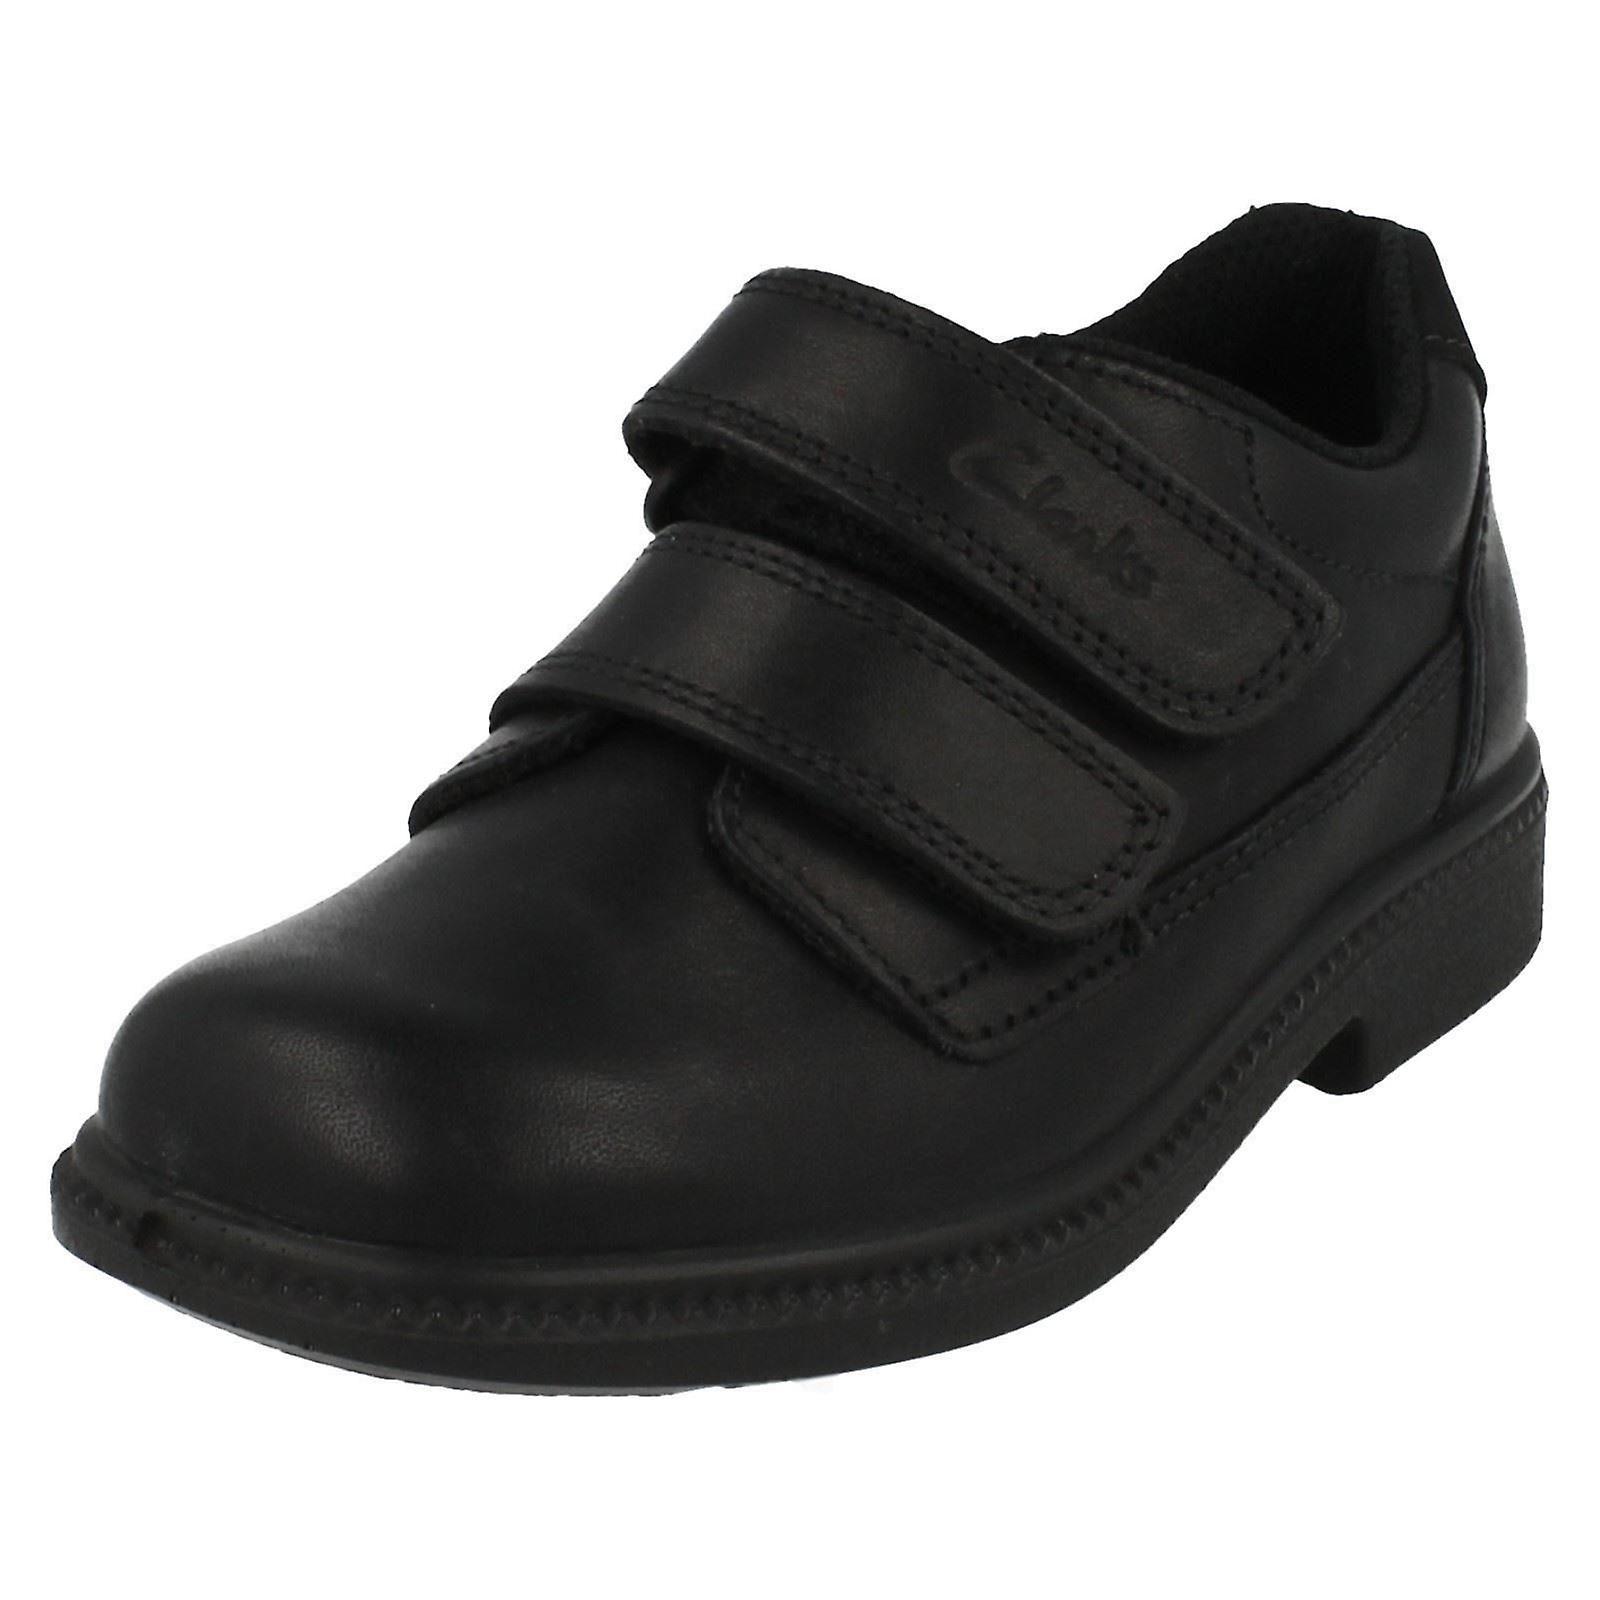 École de garçons Clarks chaussures Morecambe